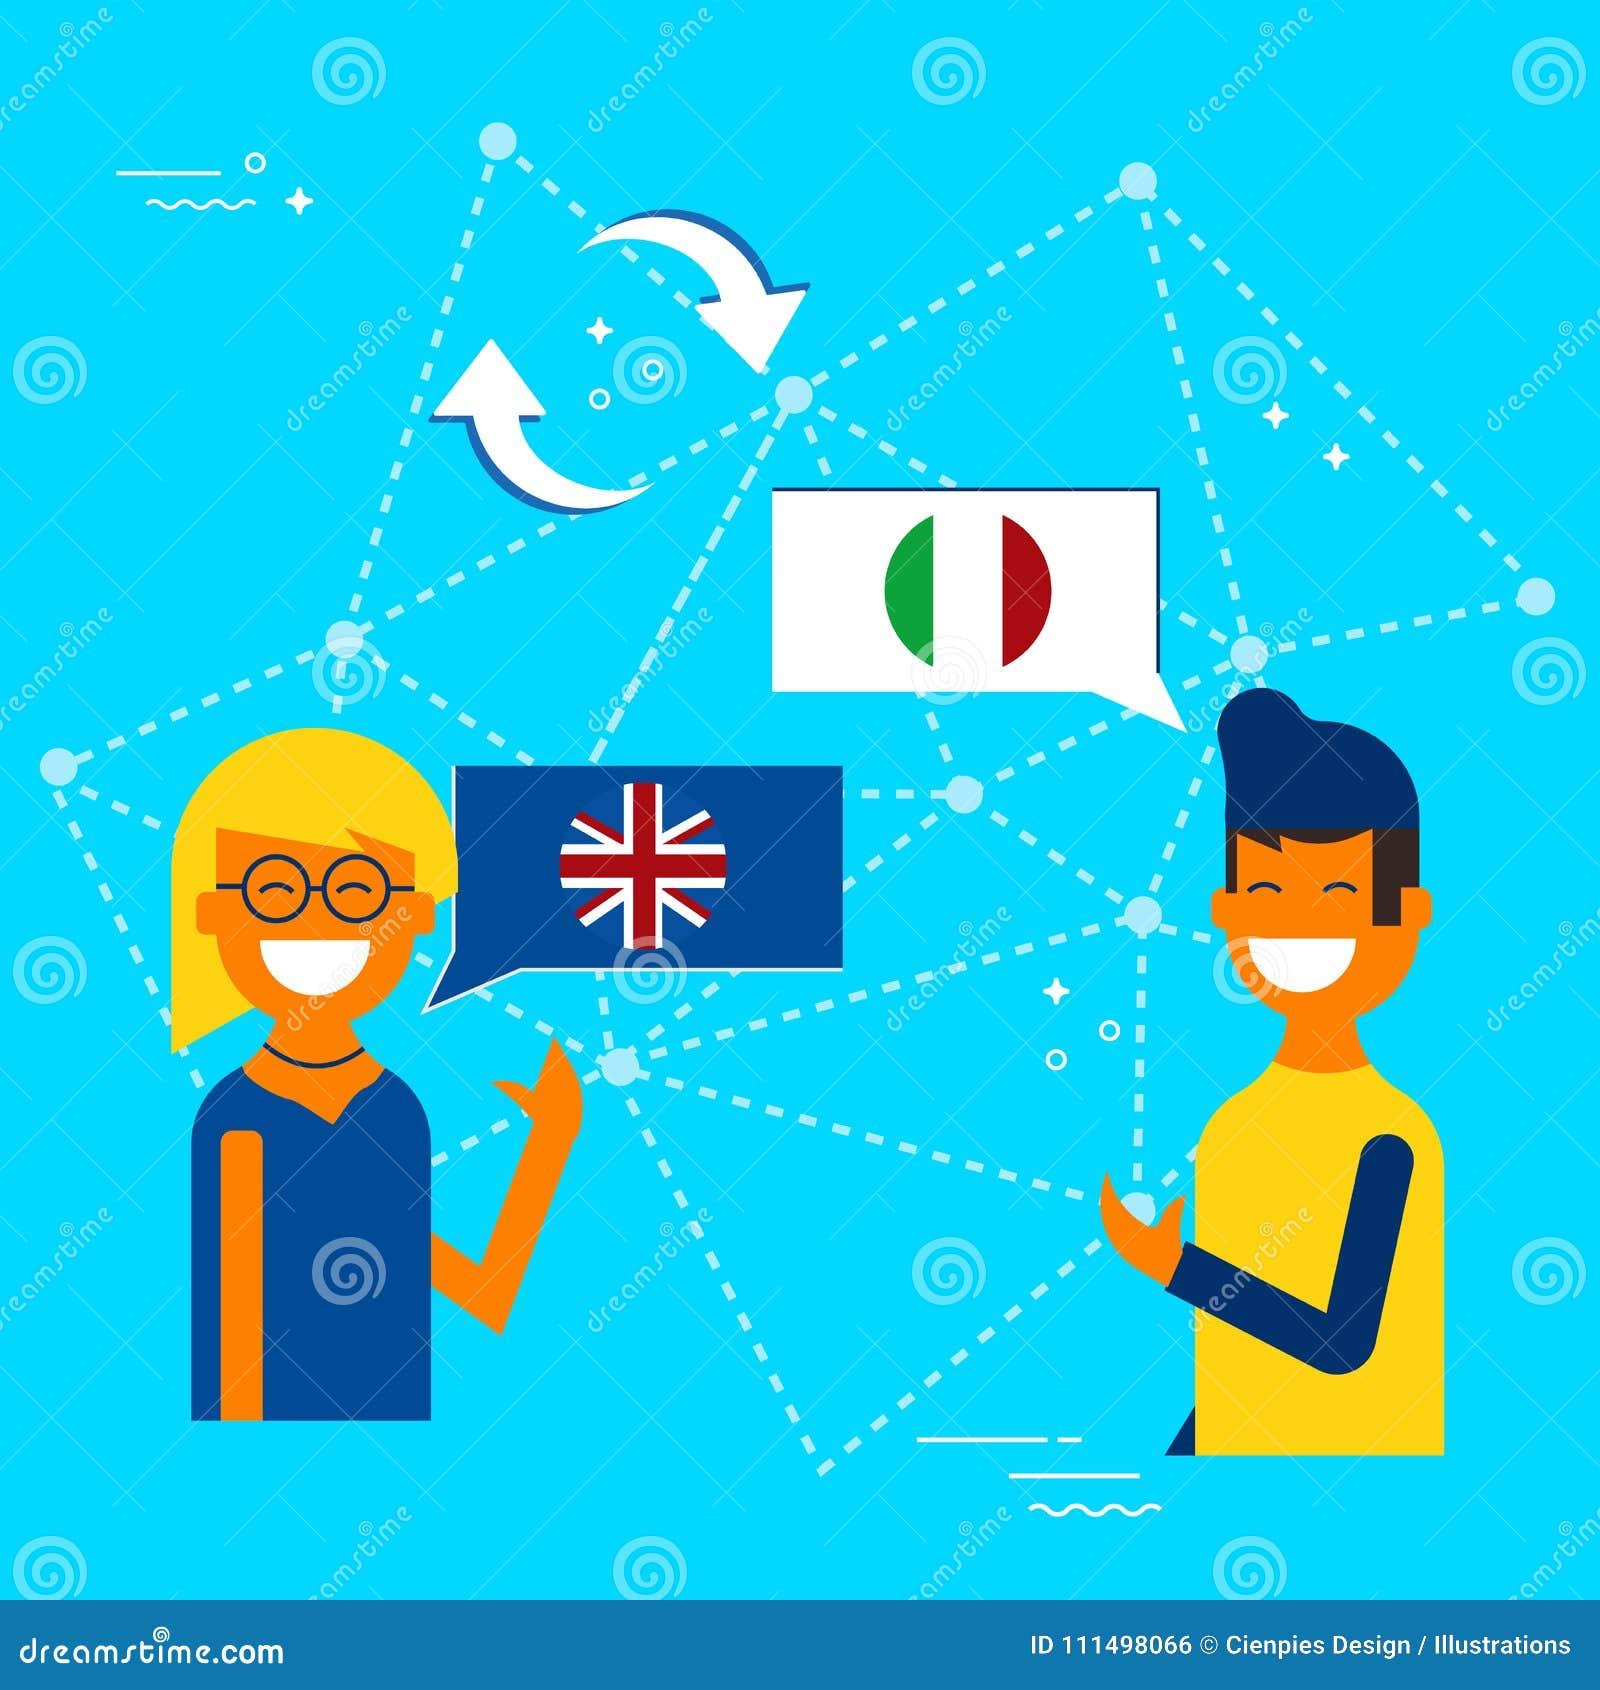 Italian To English Translation Online: Italian And English Online Chat Translation Stock Vector